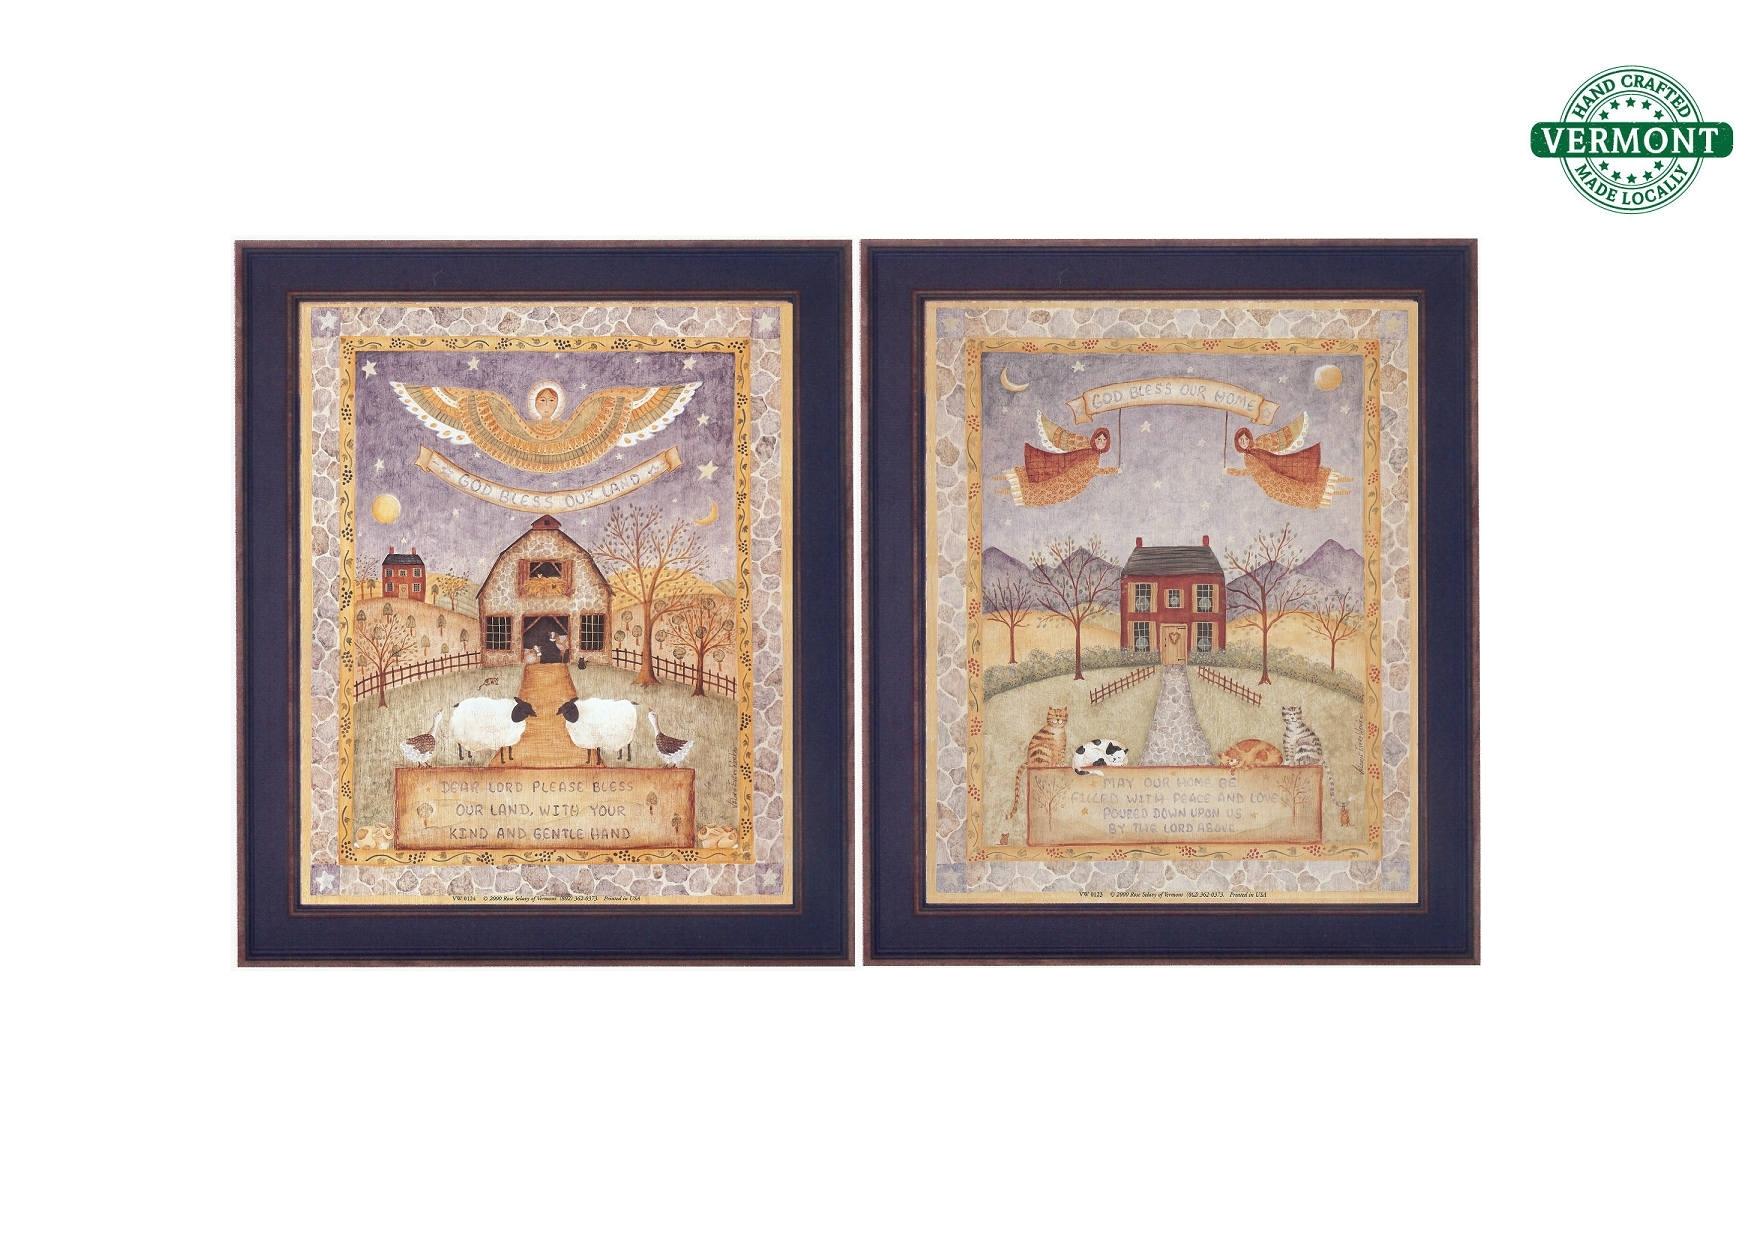 Set Of 2 Vintage Framed Folk Art Prints God Bless Our Home With Regard To Best And Newest Framed Folk Art Prints (Gallery 6 of 15)